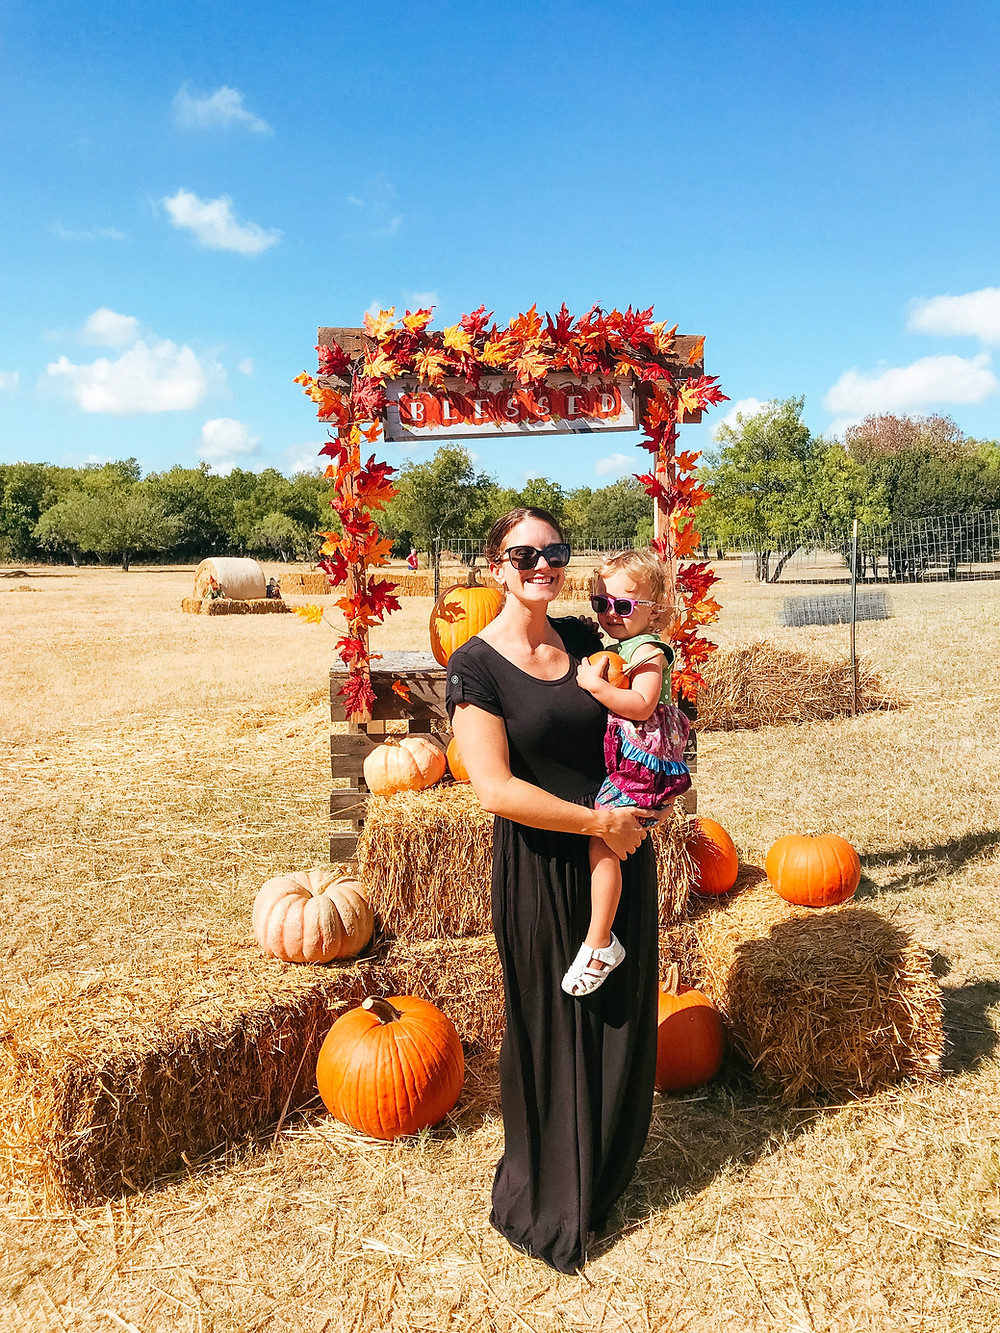 Mom and daughter at SATX pumpkin patch in Matilda Jane